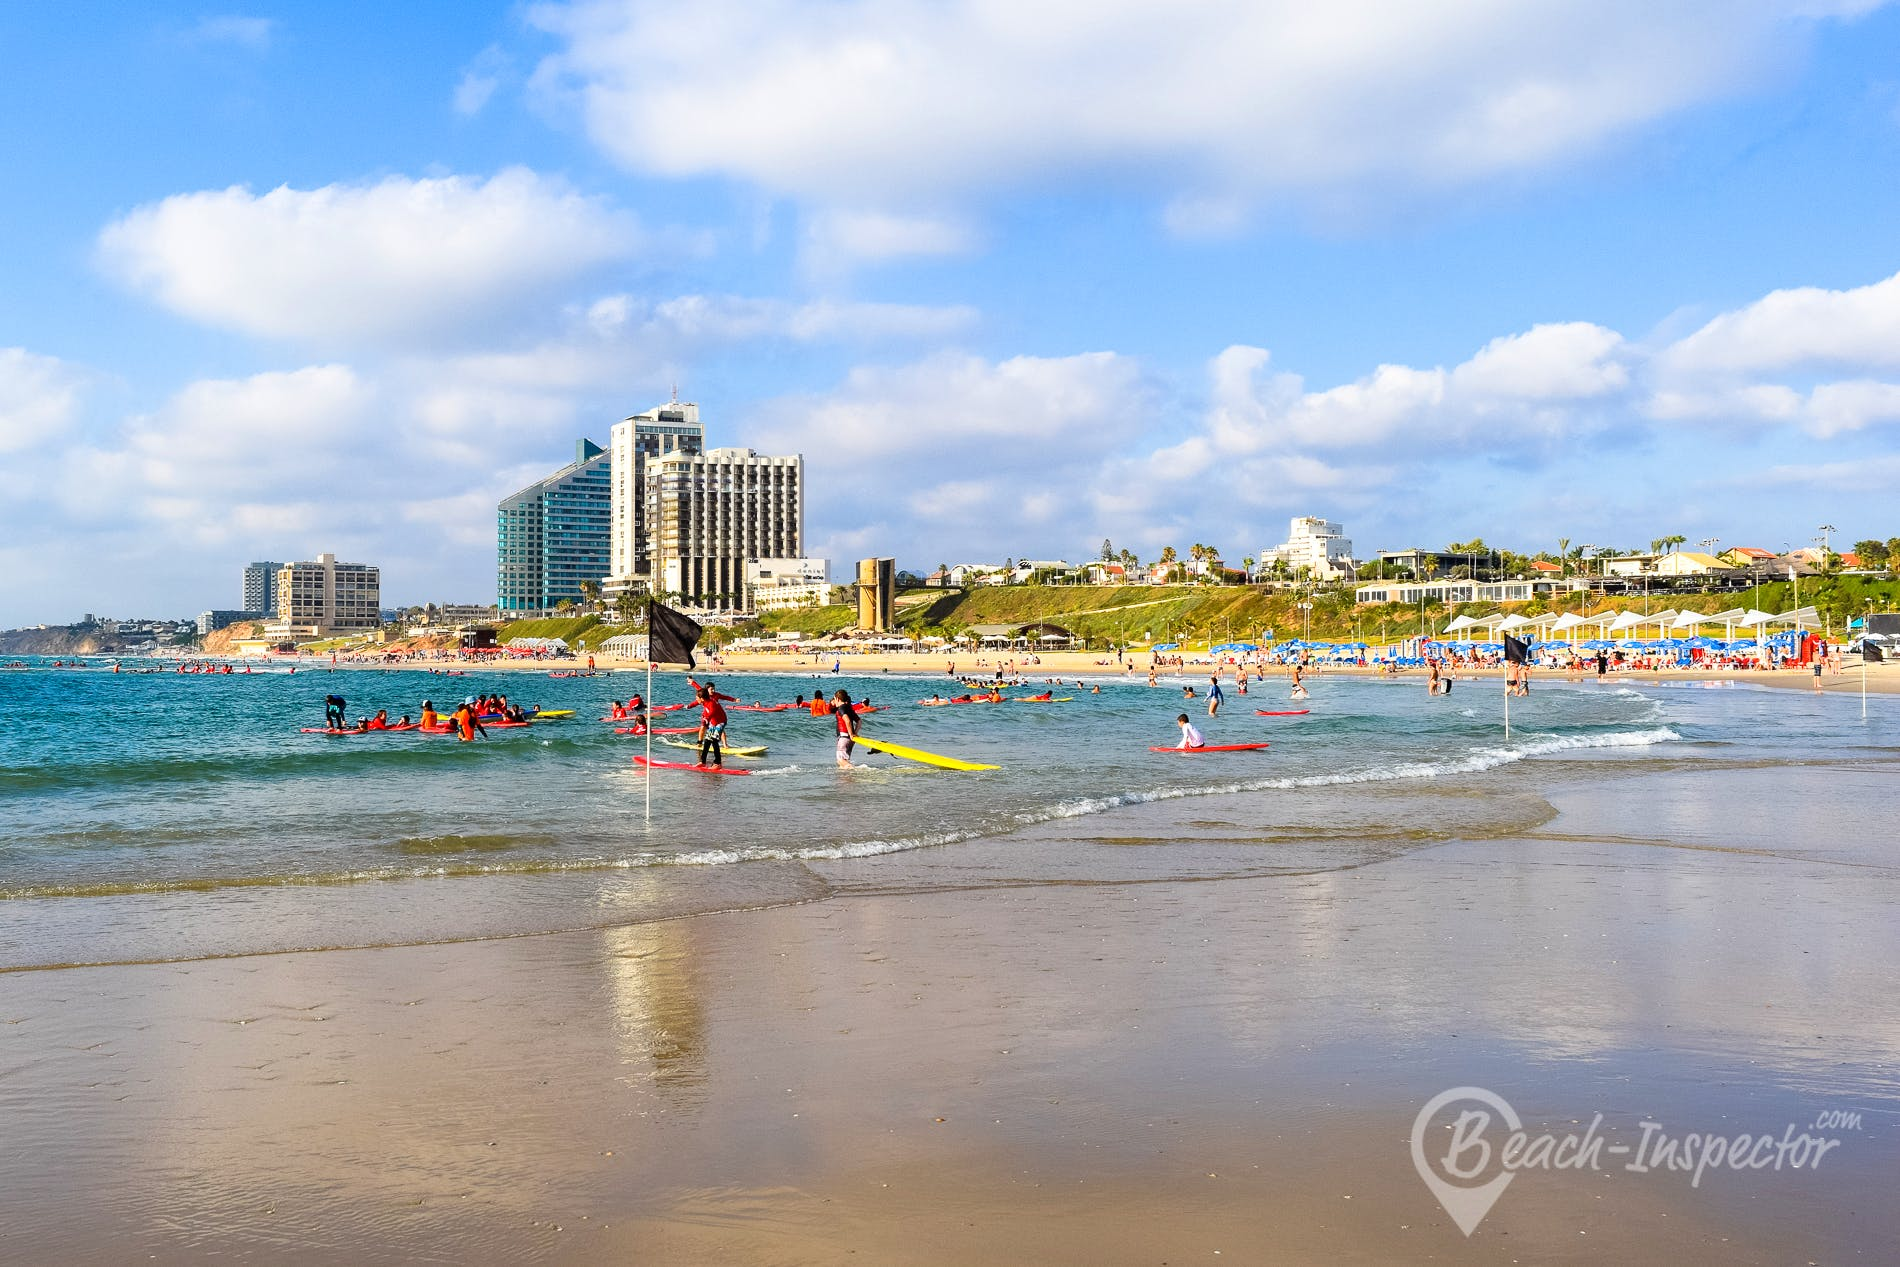 Strand Acadia Beach, Israel, Israel